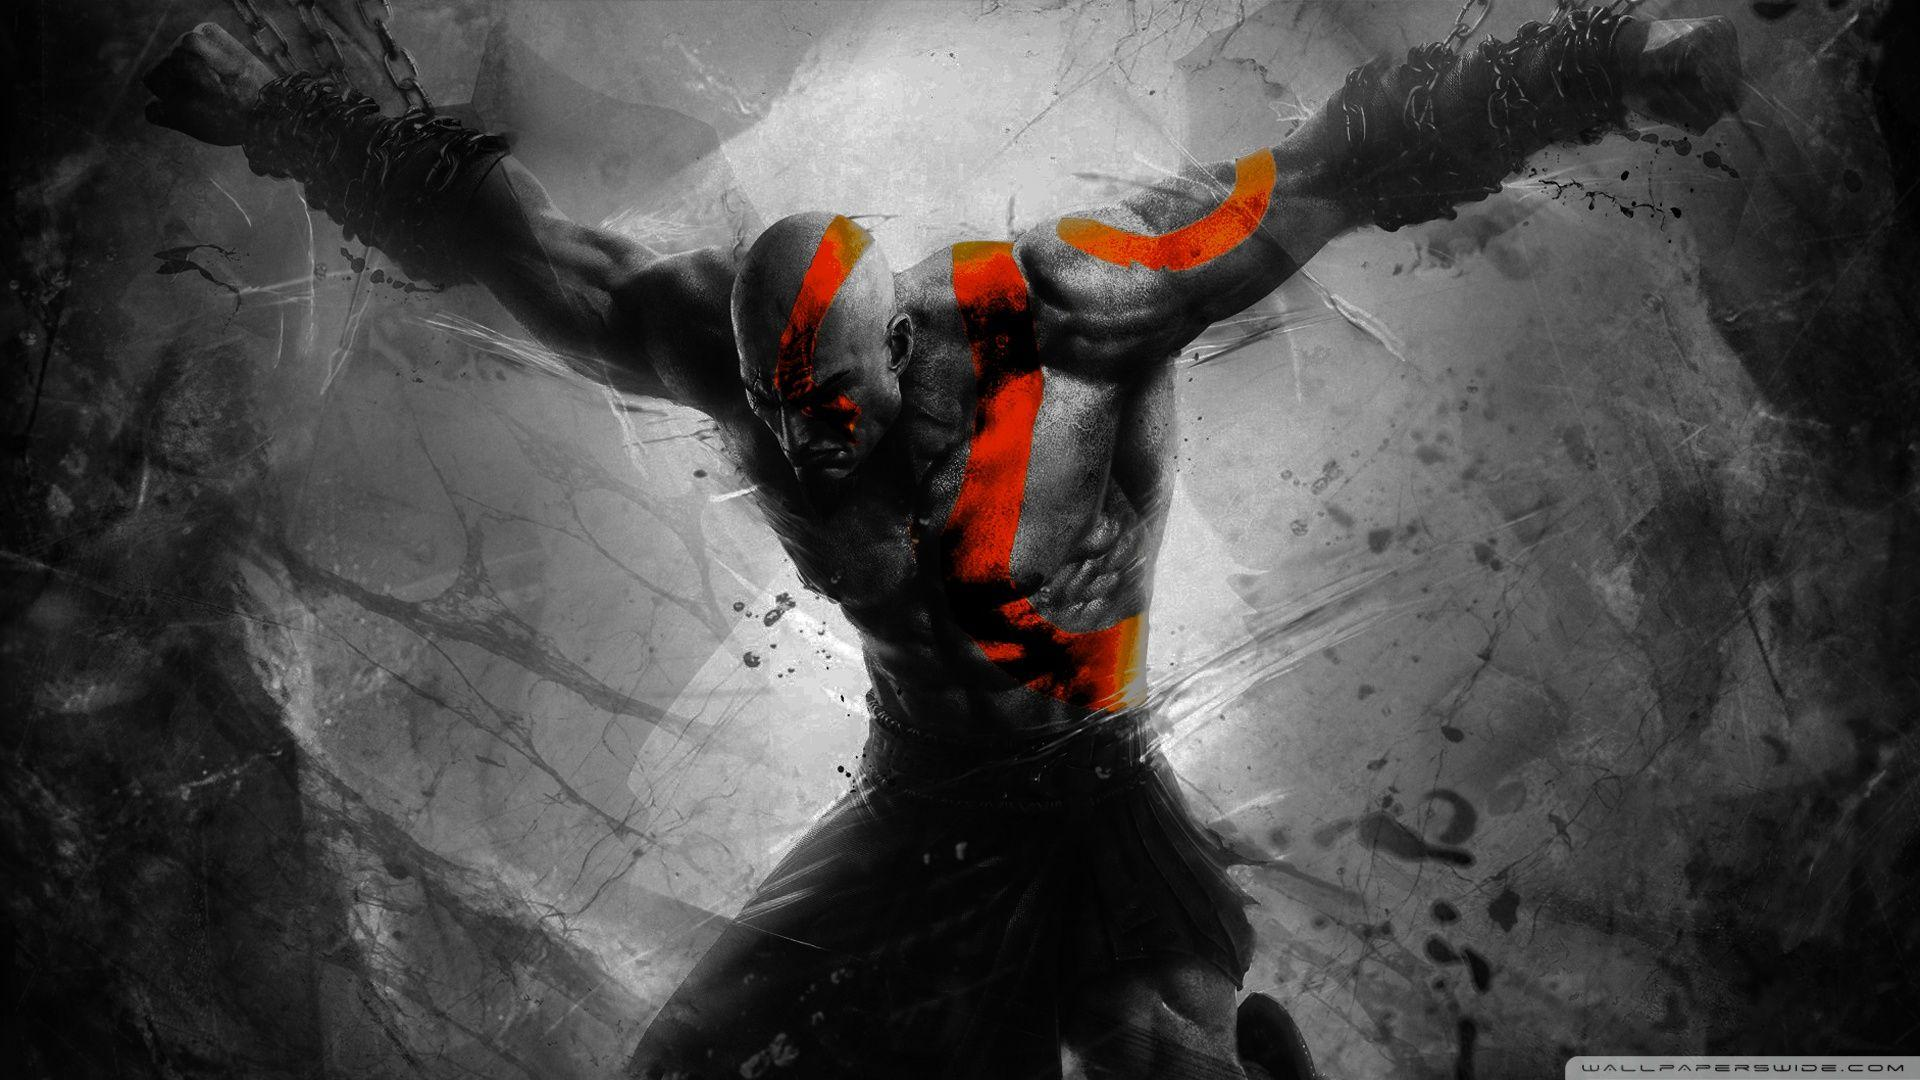 WallpapersWide.com | God Of War HD Desktop Wallpapers for ...